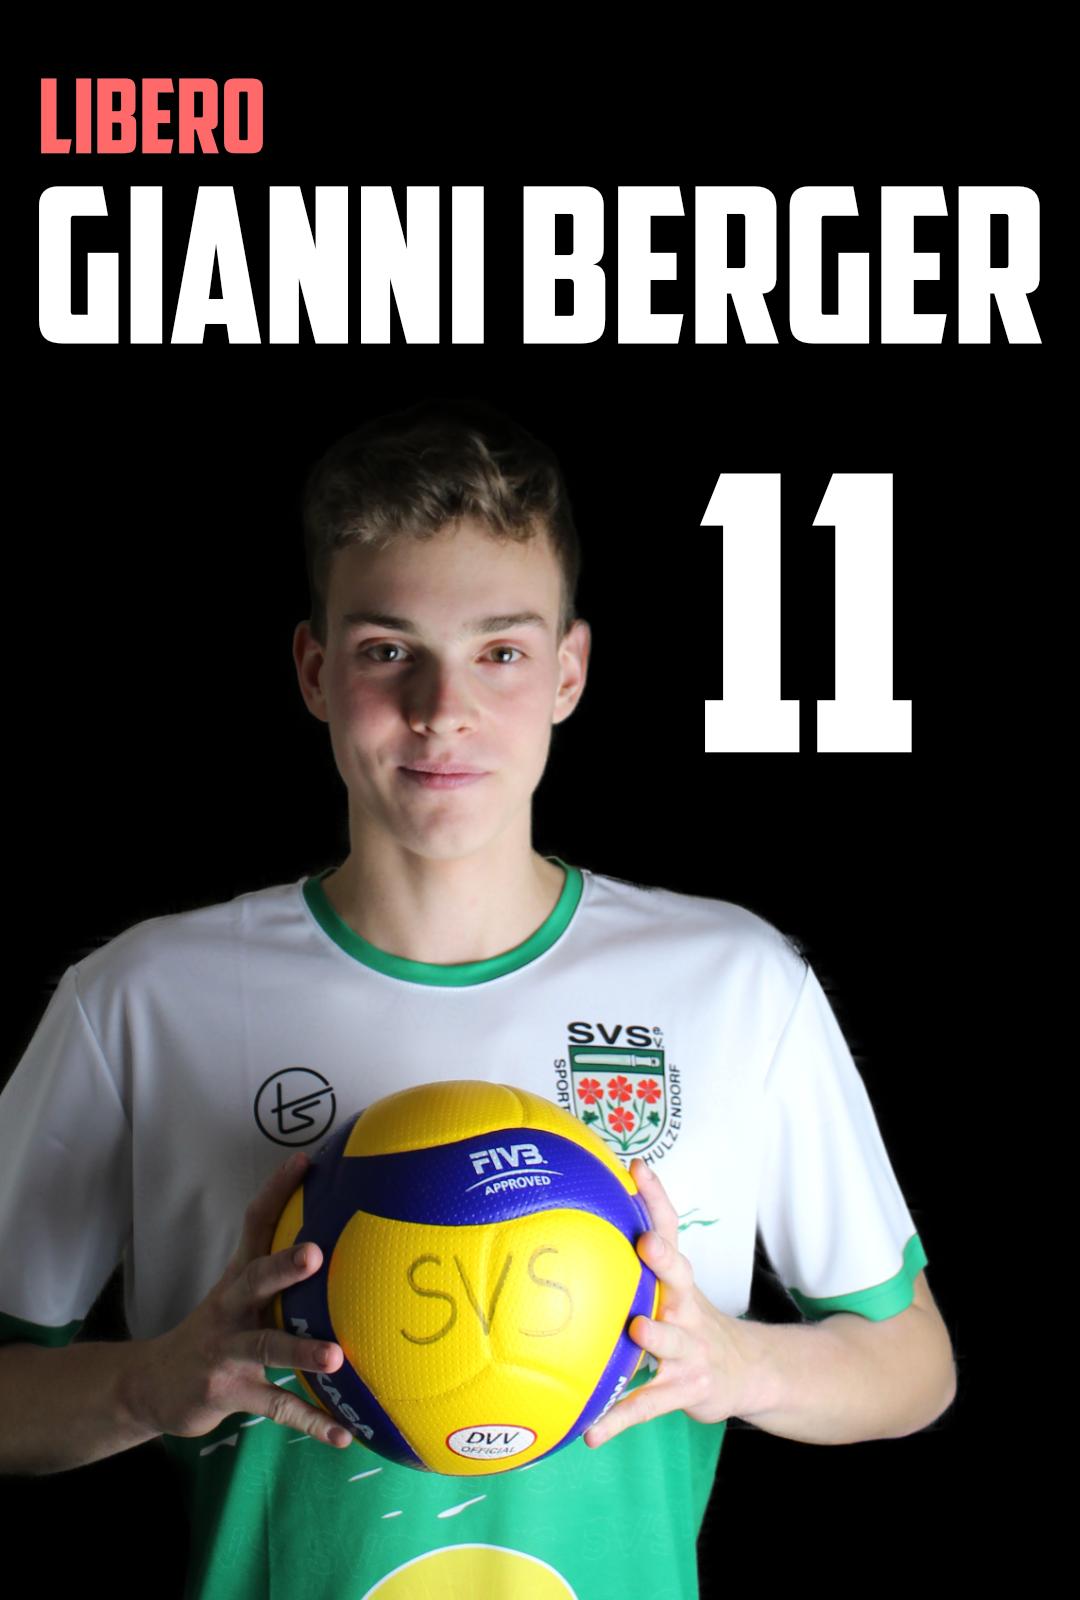 Gianni Berger